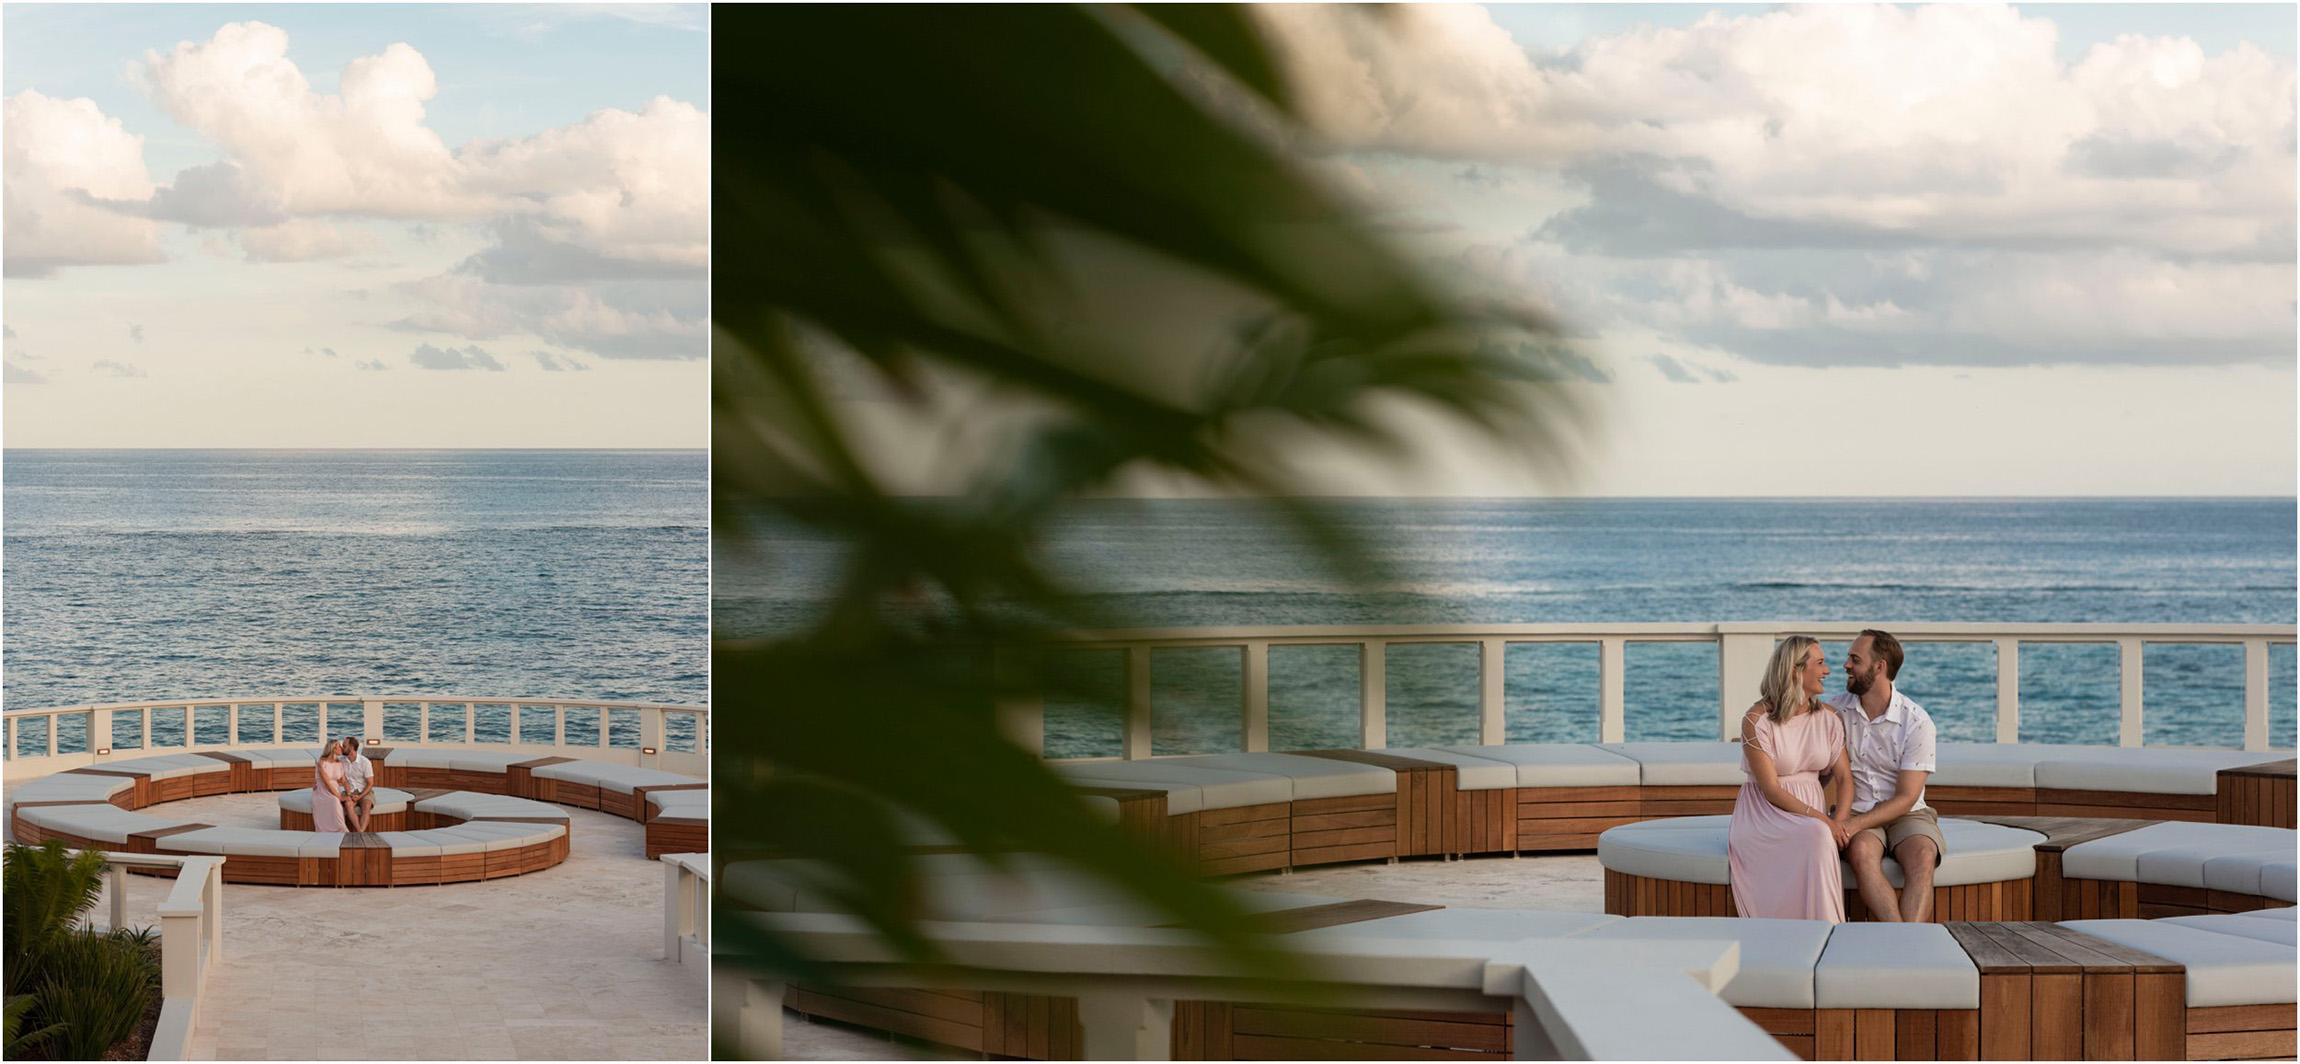 ©FianderFoto_Bermuda_Tom Moore's Jungle_Proposal Maternity Photographer_Erika_Andy_019.jpg